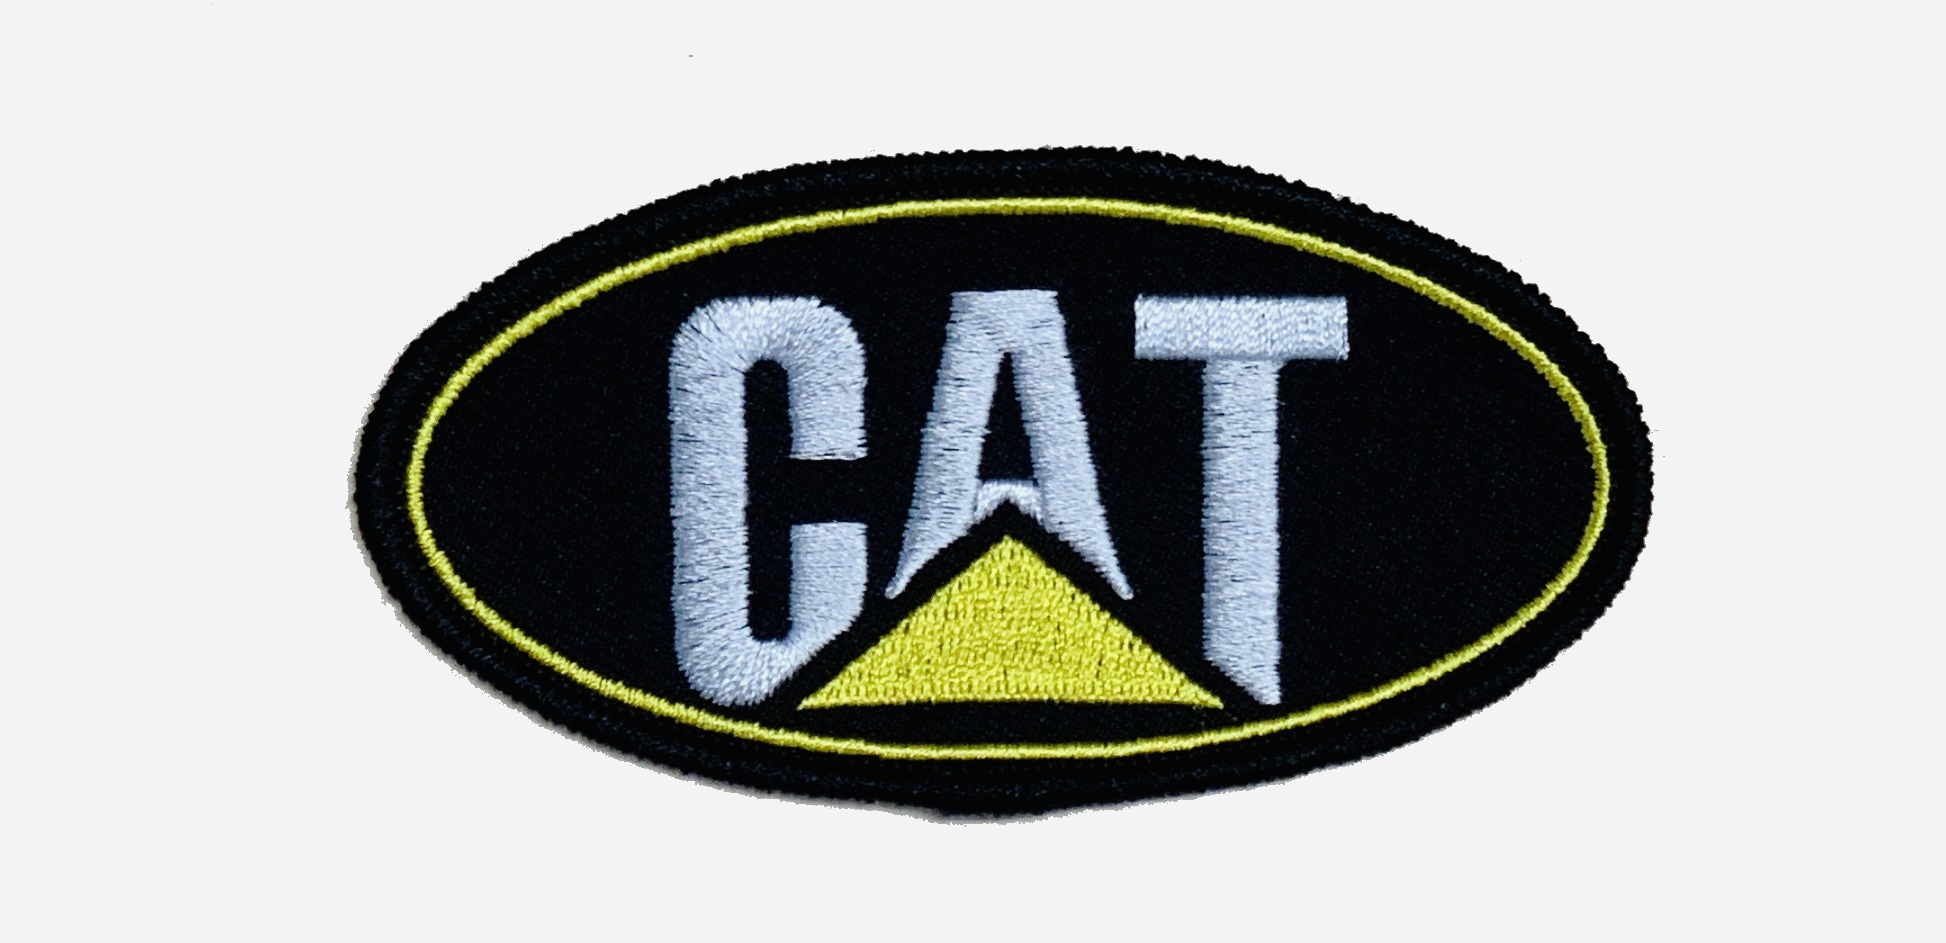 Vintage style cat caterpillar logo